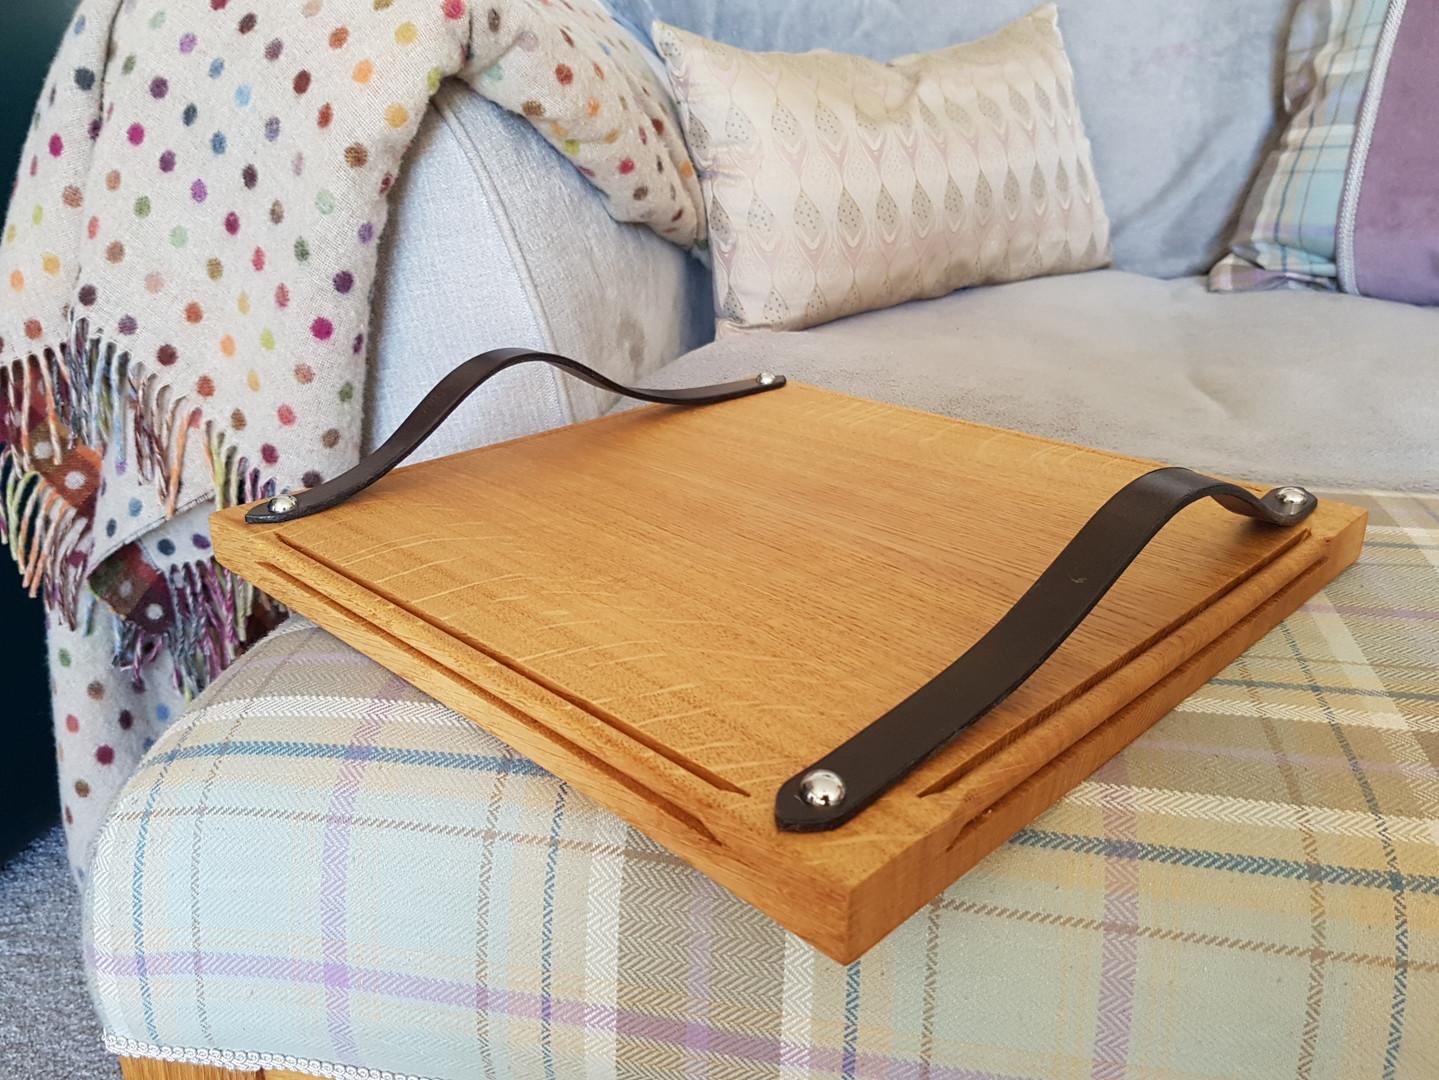 Oak Tray on Upholstered Bench